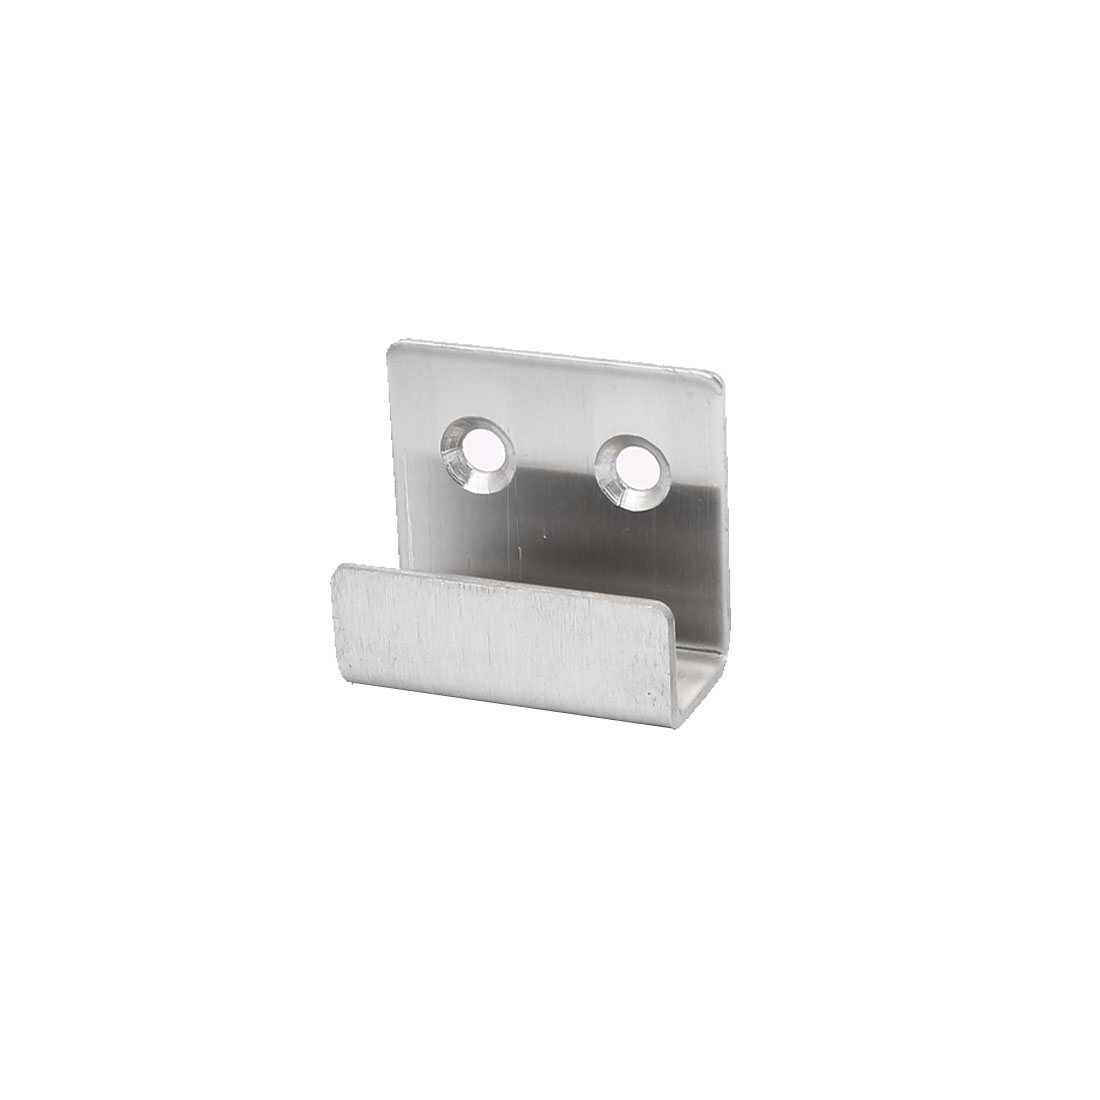 Ceramic Tile Display Stainless Steel Wall Hanger Fastener Silver Tone